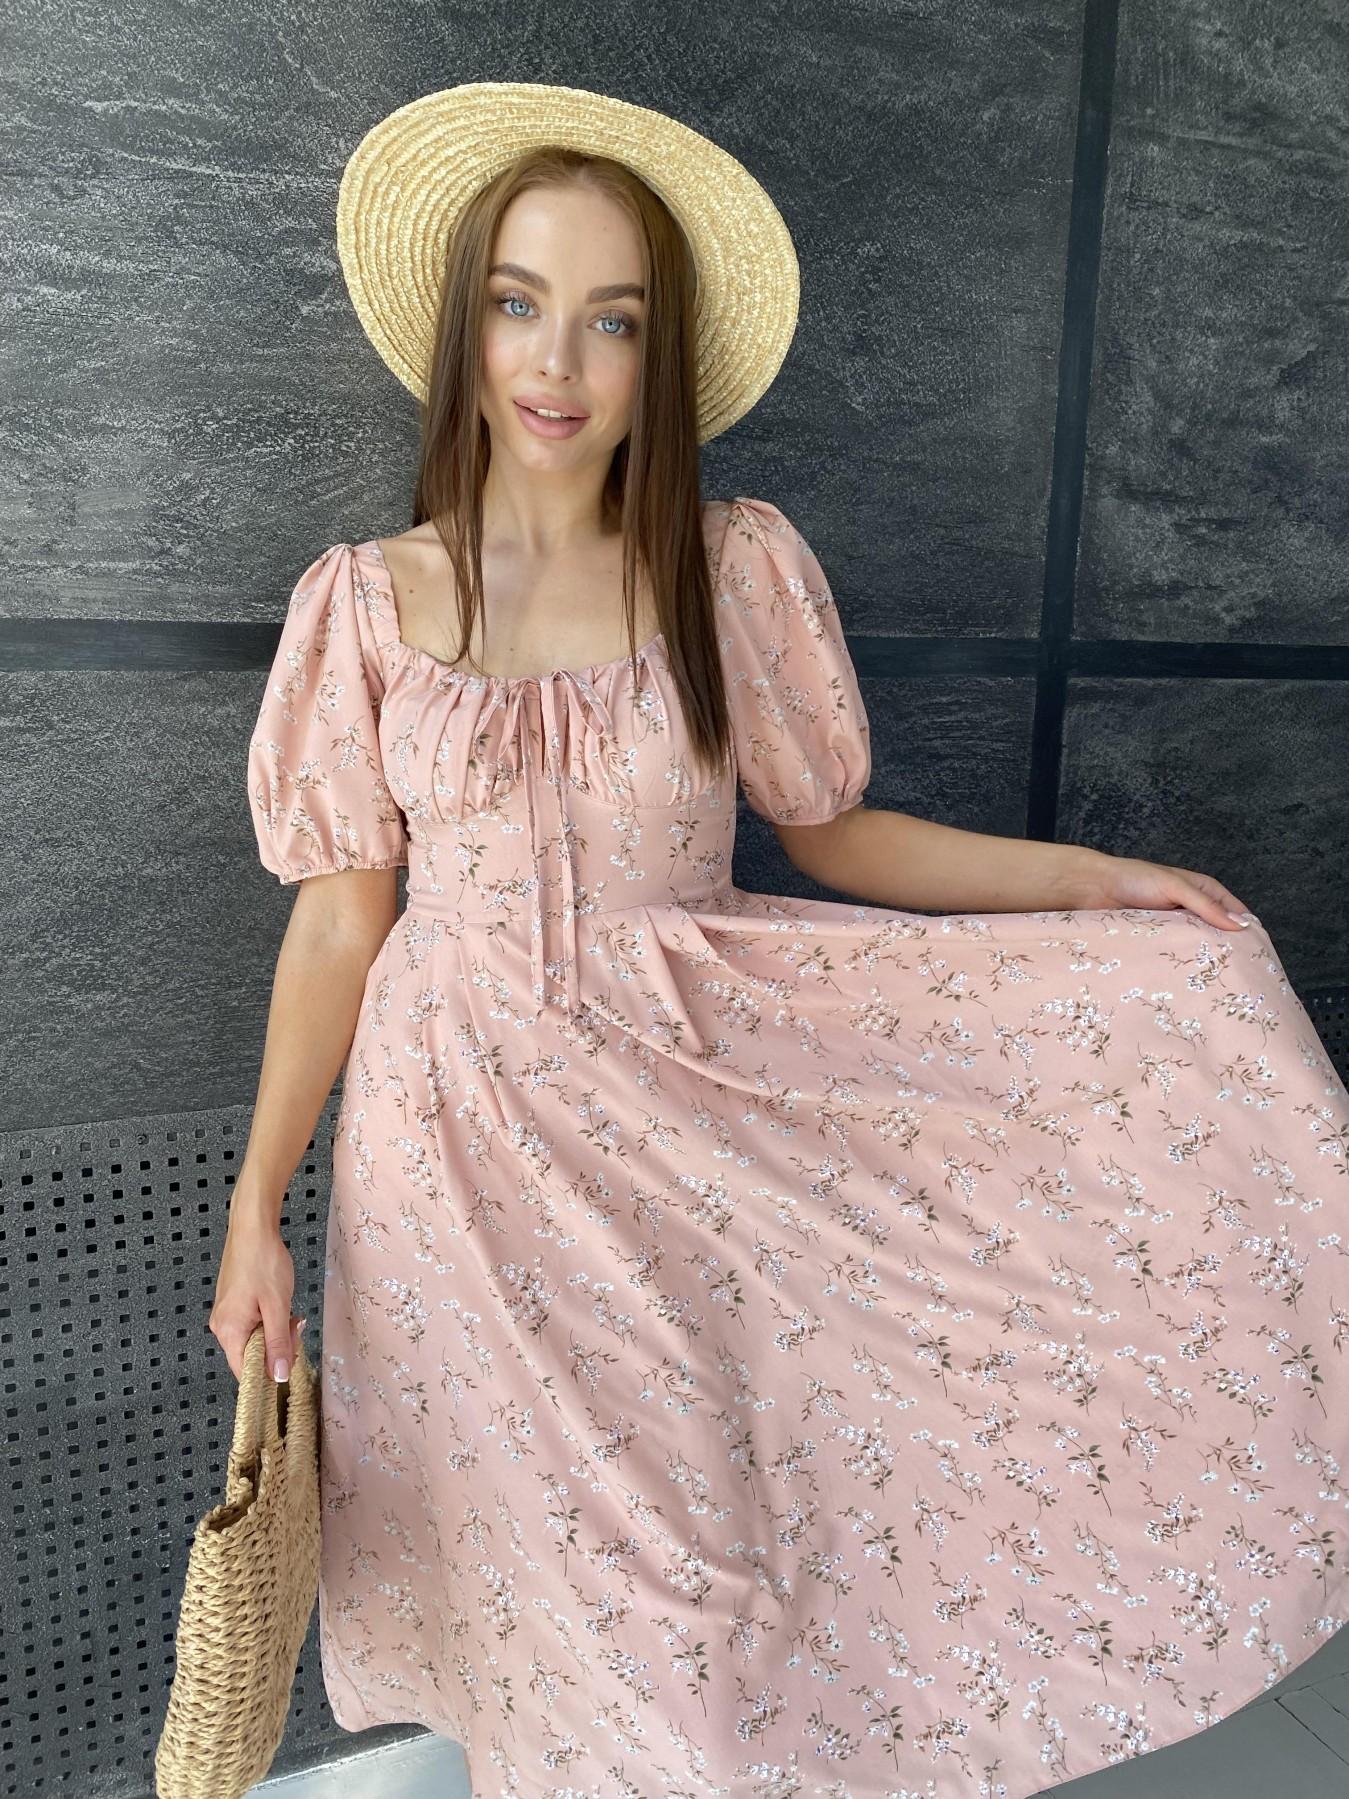 Кисес Миди платье из софт ткани в принт 11348 АРТ. 48150 Цвет: Пудра/букетики/бел/зел - фото 4, интернет магазин tm-modus.ru